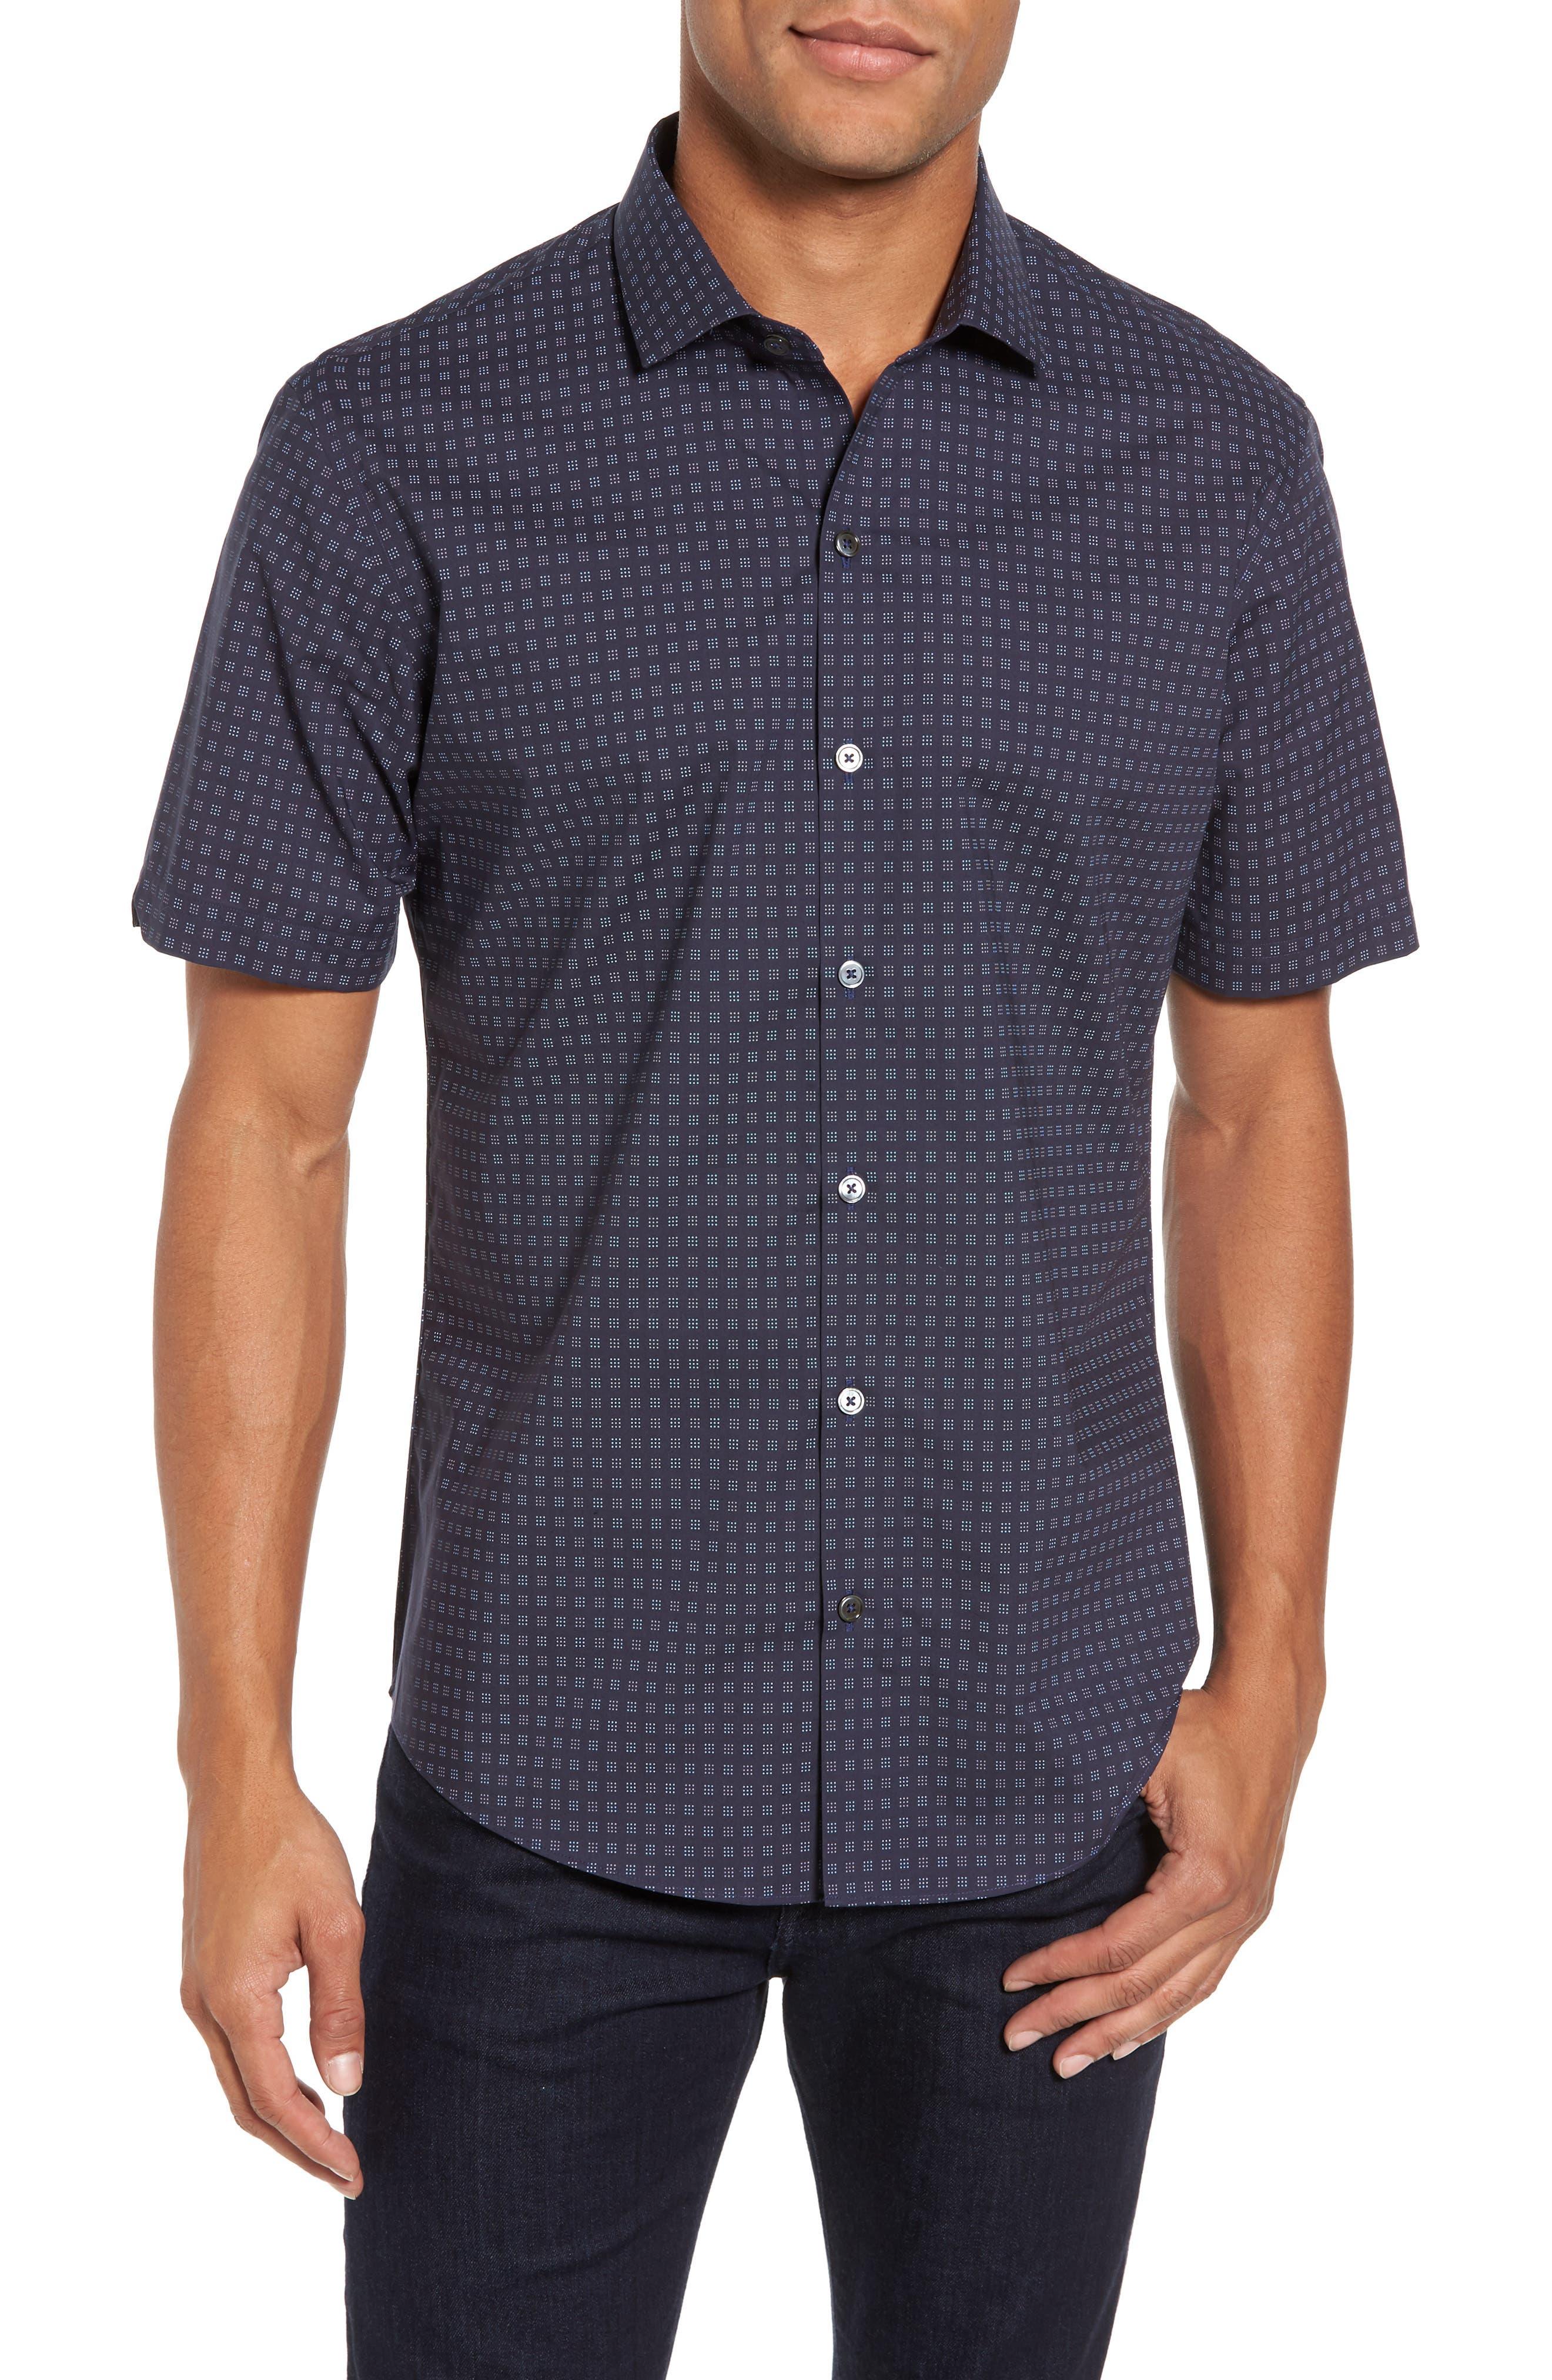 Main Image - Zachary Prell Tennant Slim Fit Dot Print Sport Shirt